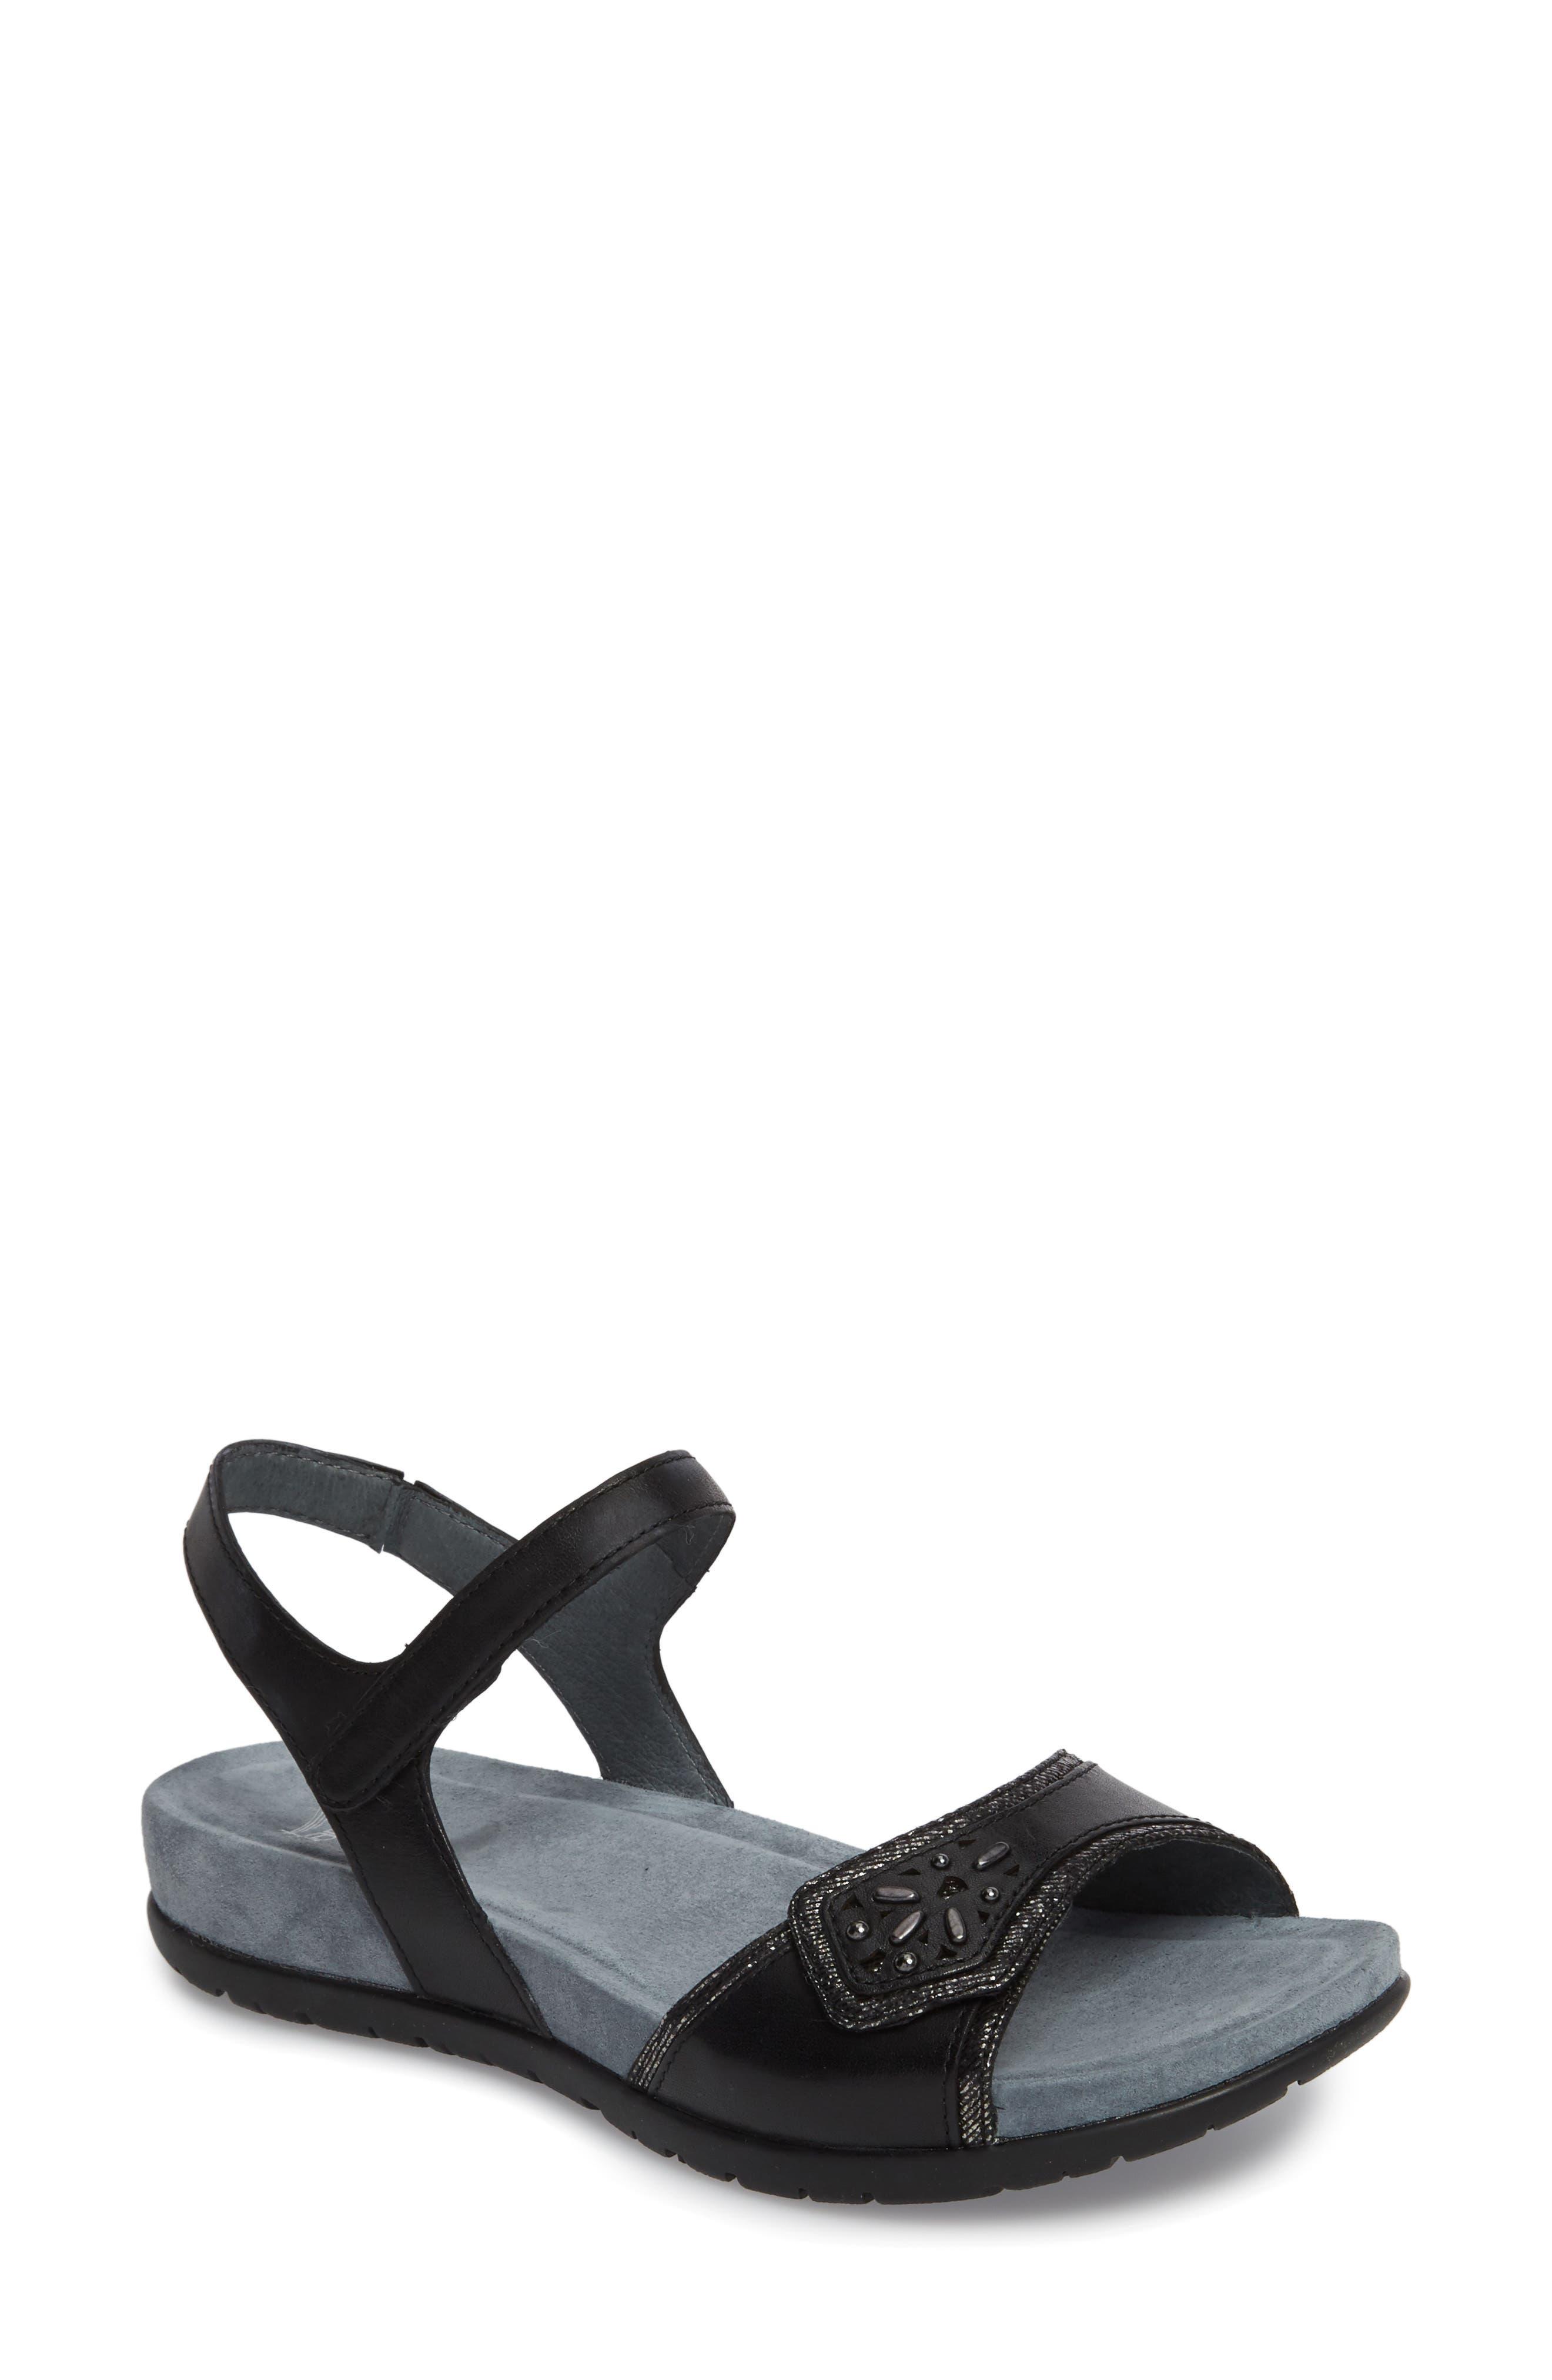 DANSKO Blythe Sandal, Main, color, 001